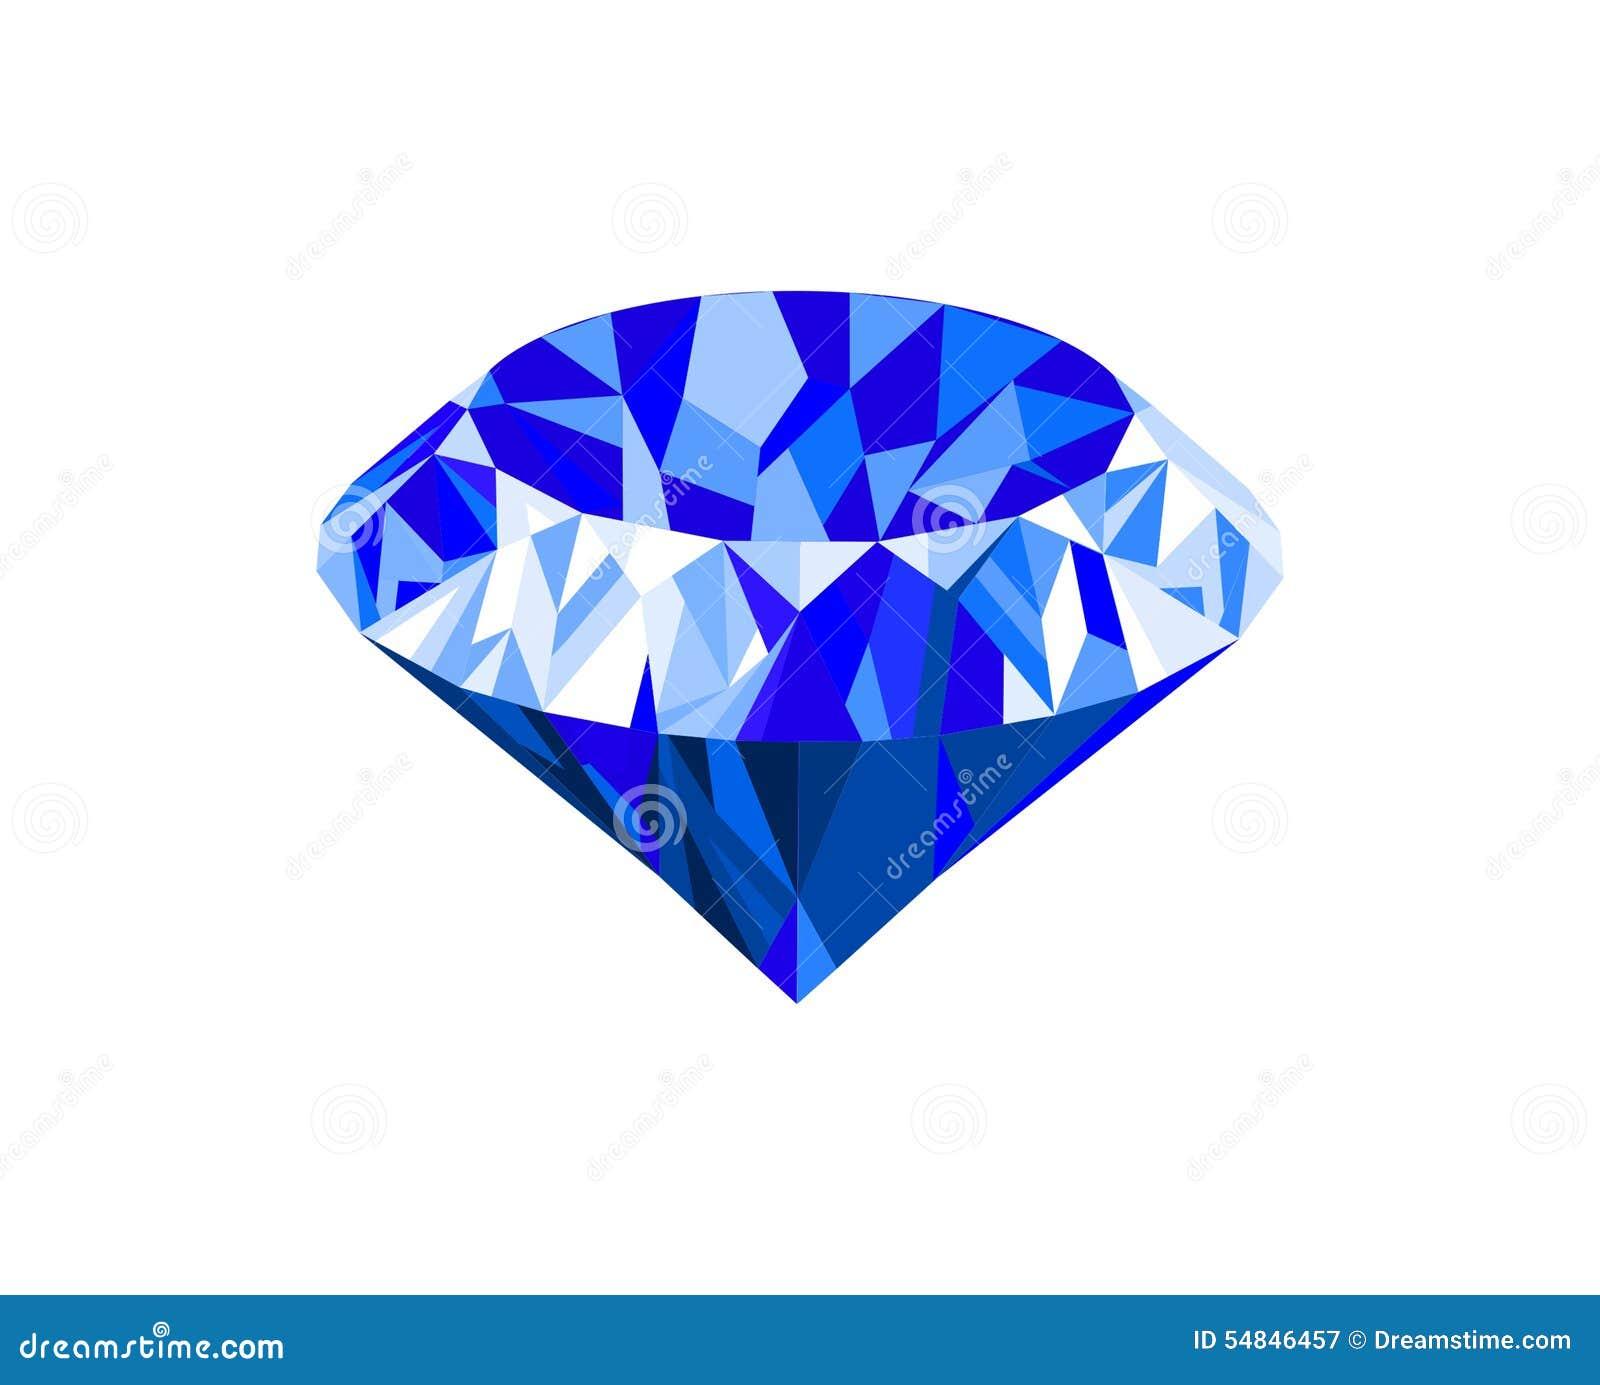 diamond stock illustration image 54846457